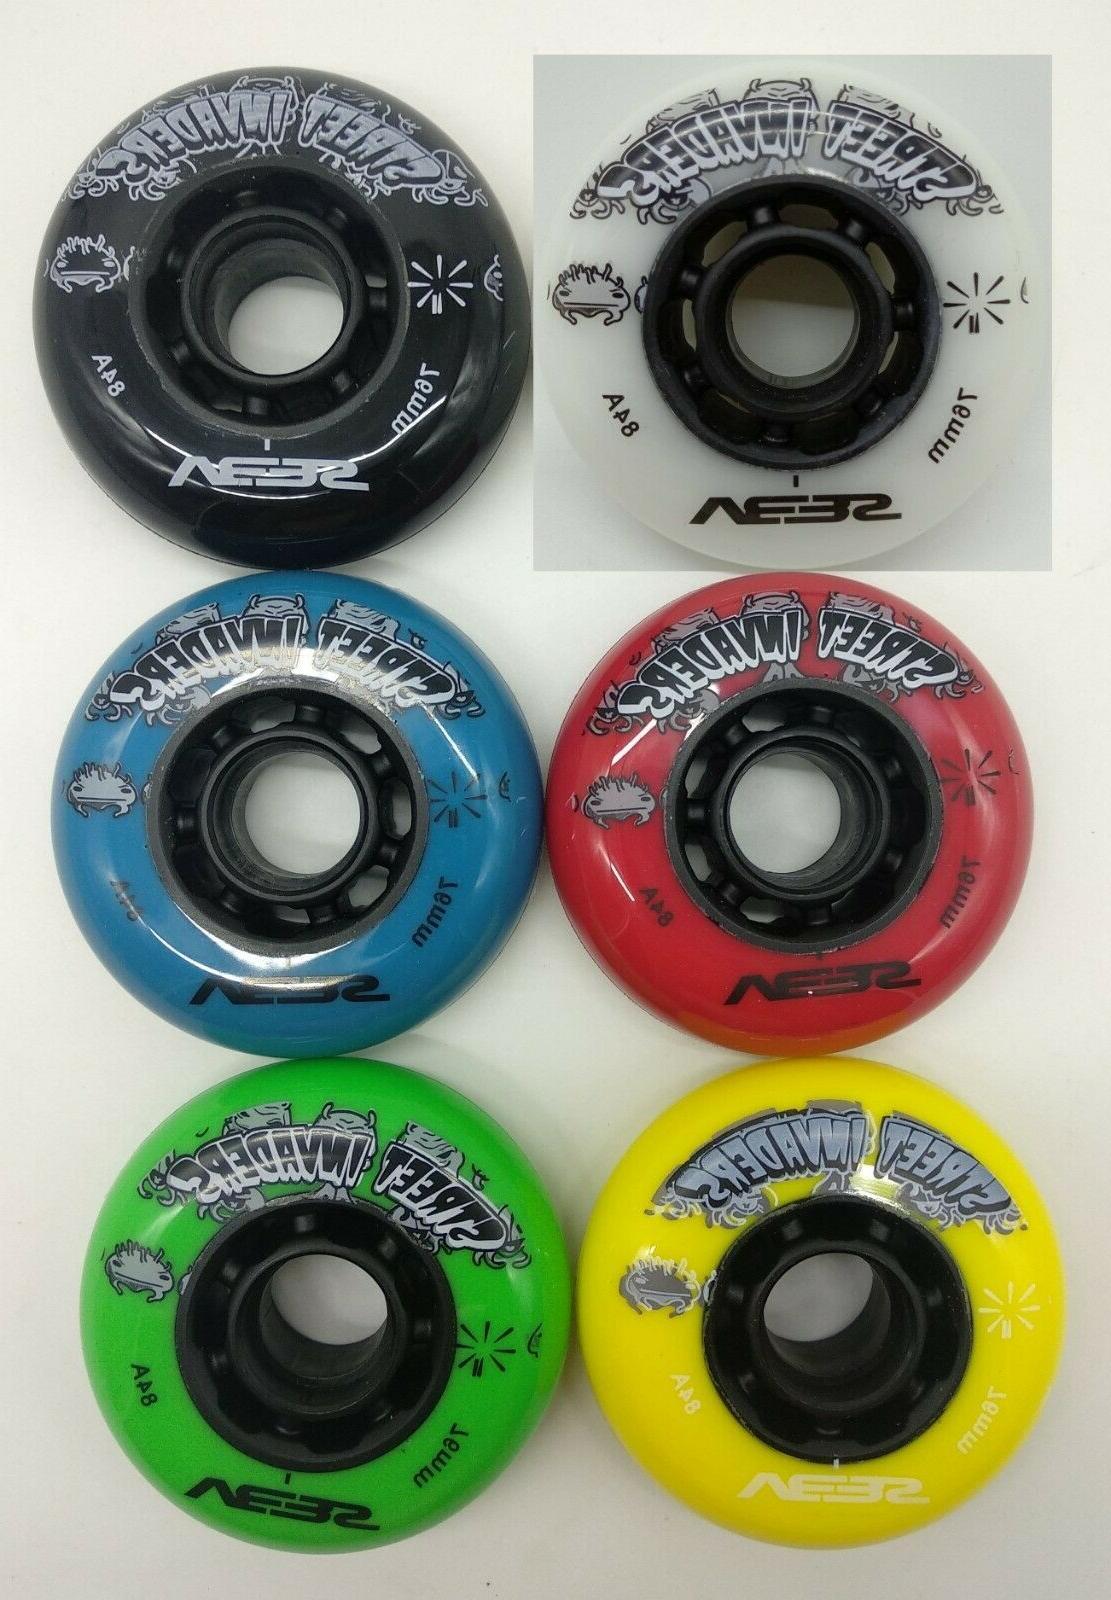 80 mm inline skates 84a wheel roller